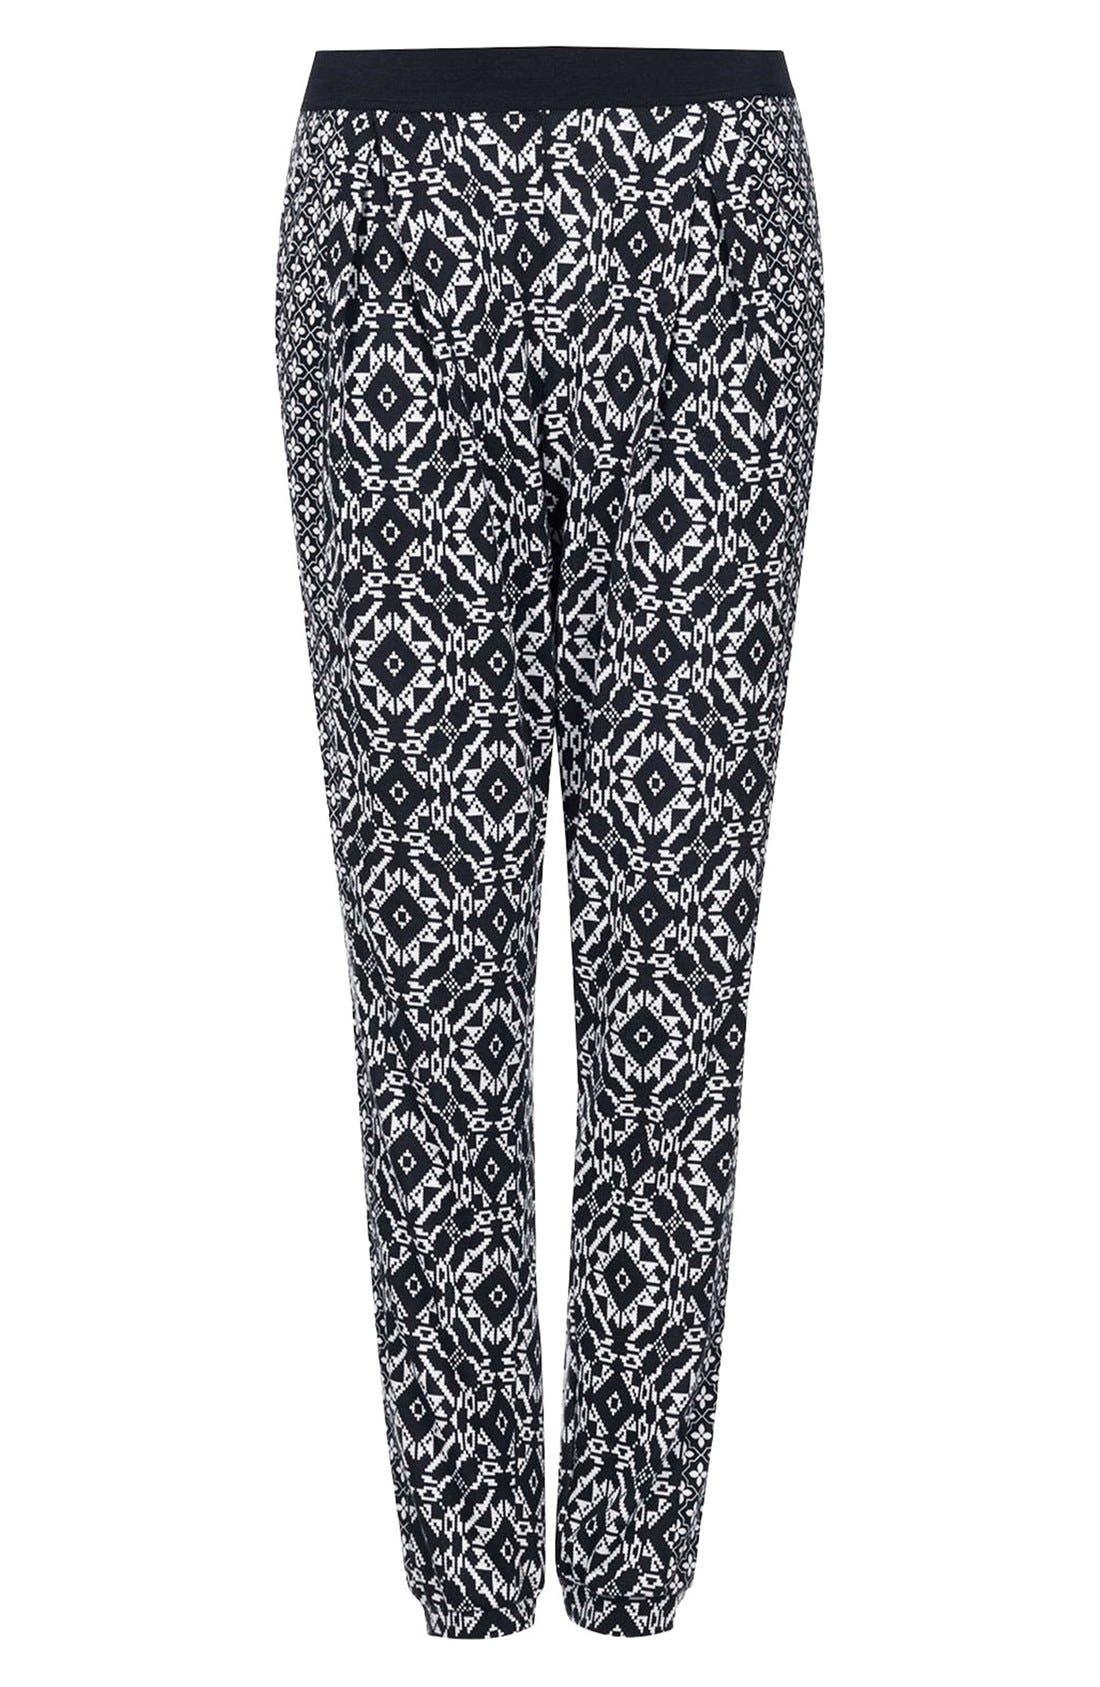 Alternate Image 3  - Topshop Mixed Print Tapered Pants (Regular & Petite)